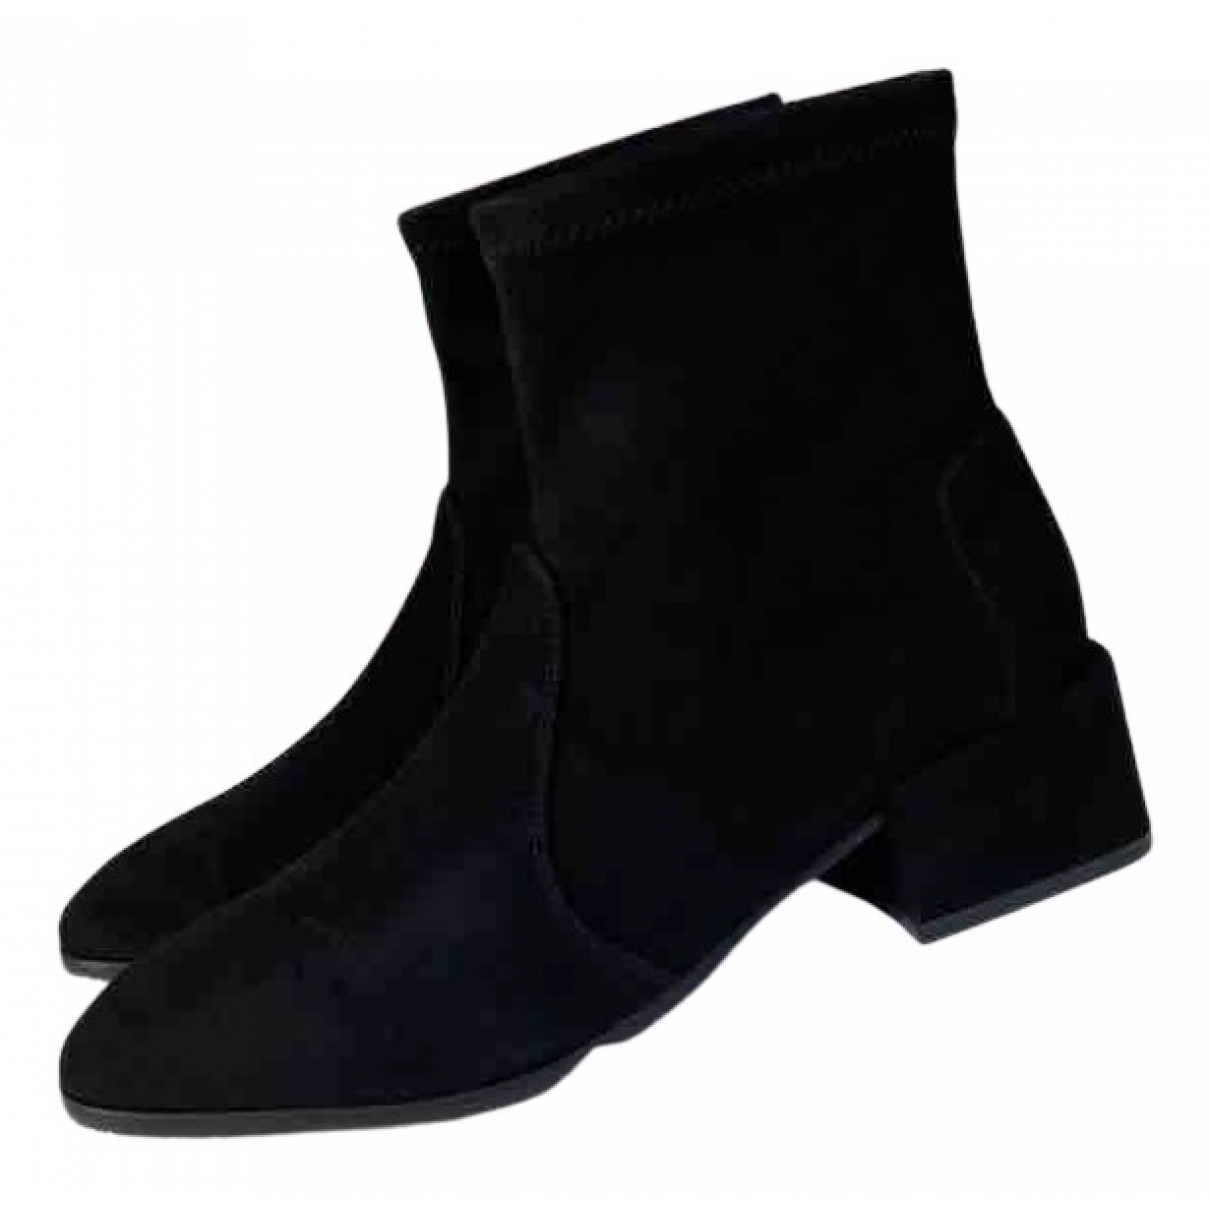 Stuart Weitzman N Black Suede Ankle boots for Women 37 EU